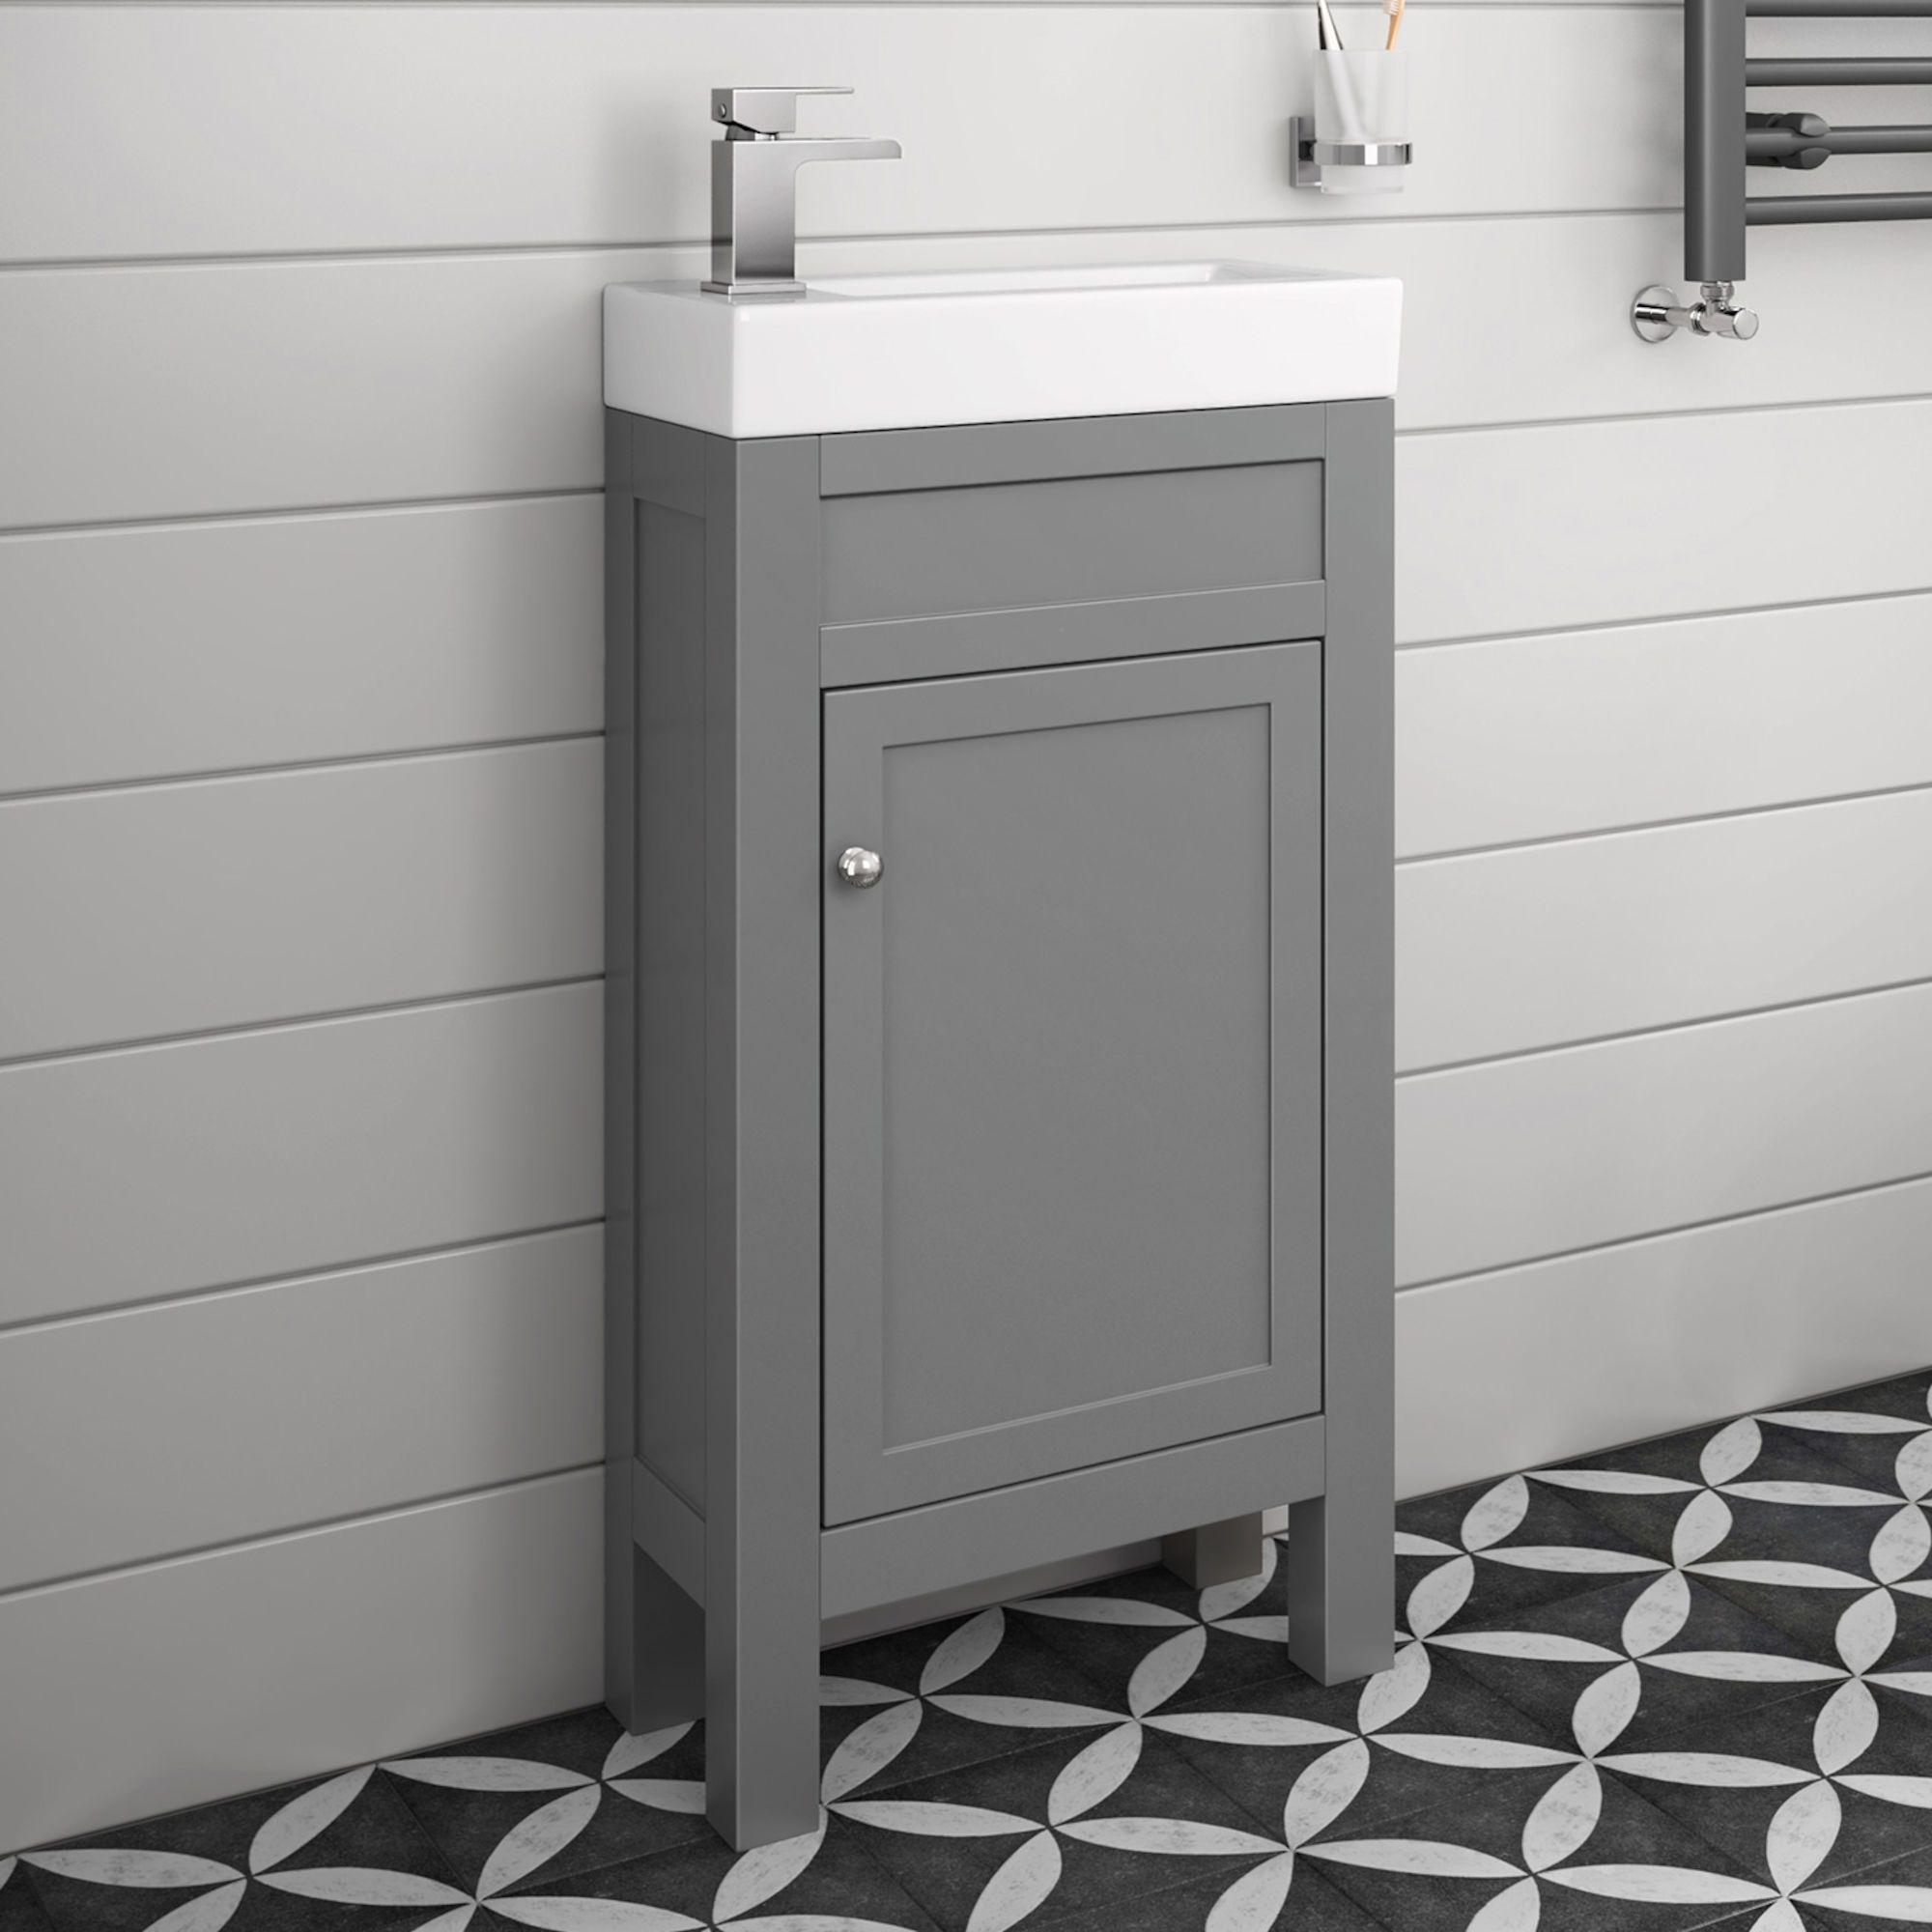 Grey Slimline Sink Vanity Unit Small Bathroom Storage Soak Com Cloakroom Vanity Unit Bathroom Vanity Units Small Bathroom Sinks